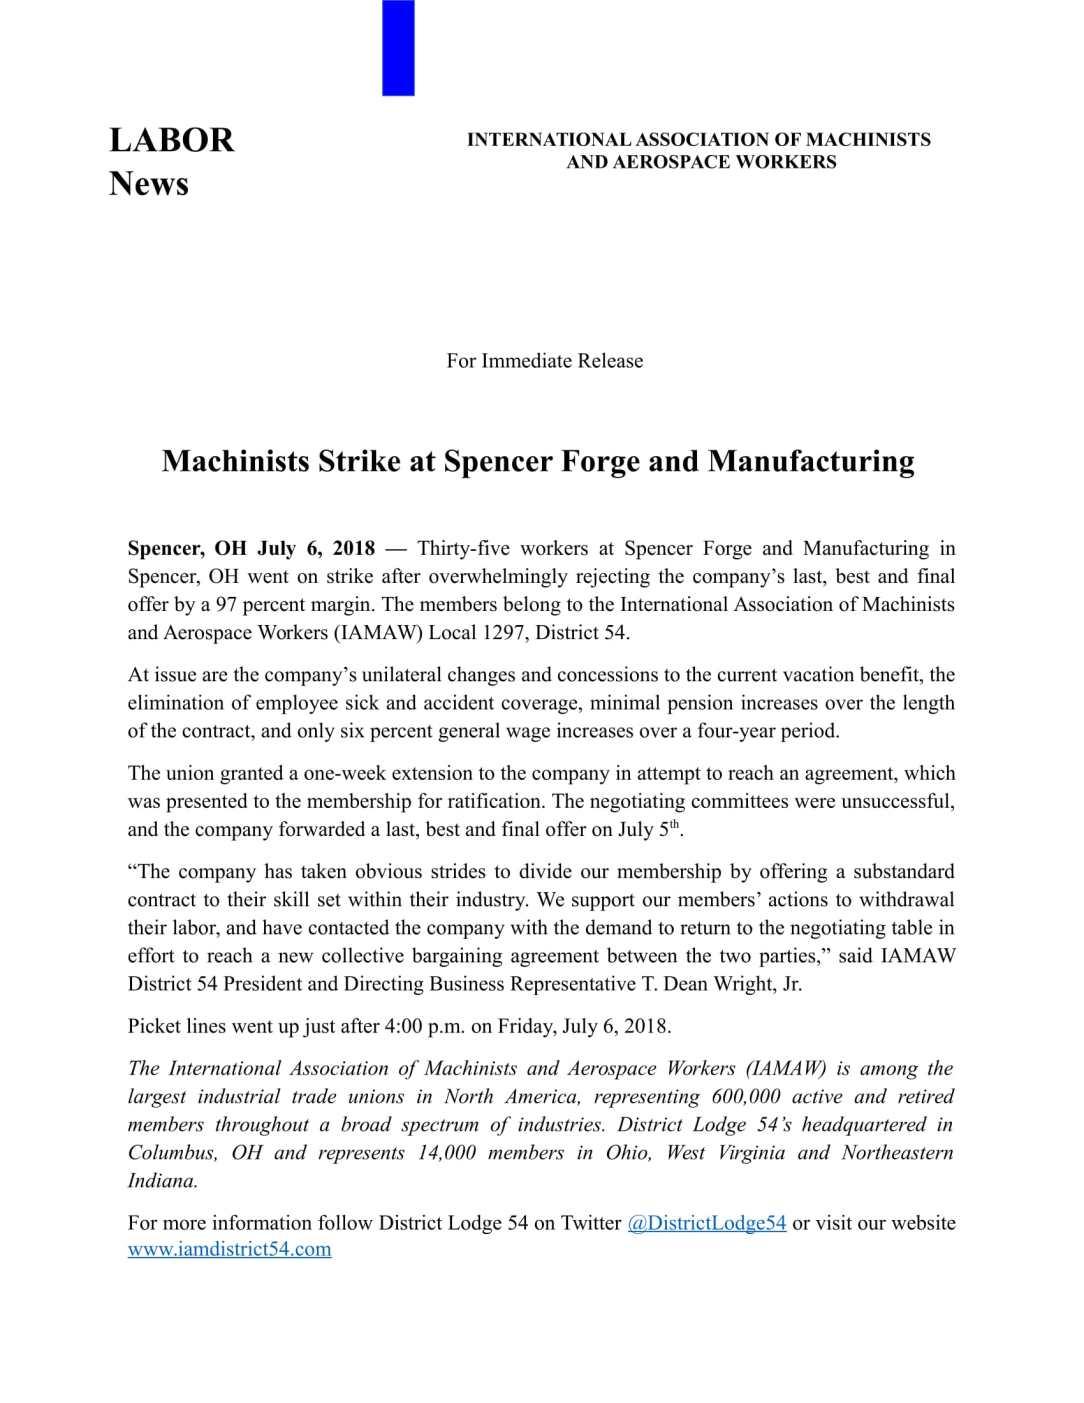 Spencer Forge Press Release-1.jpg